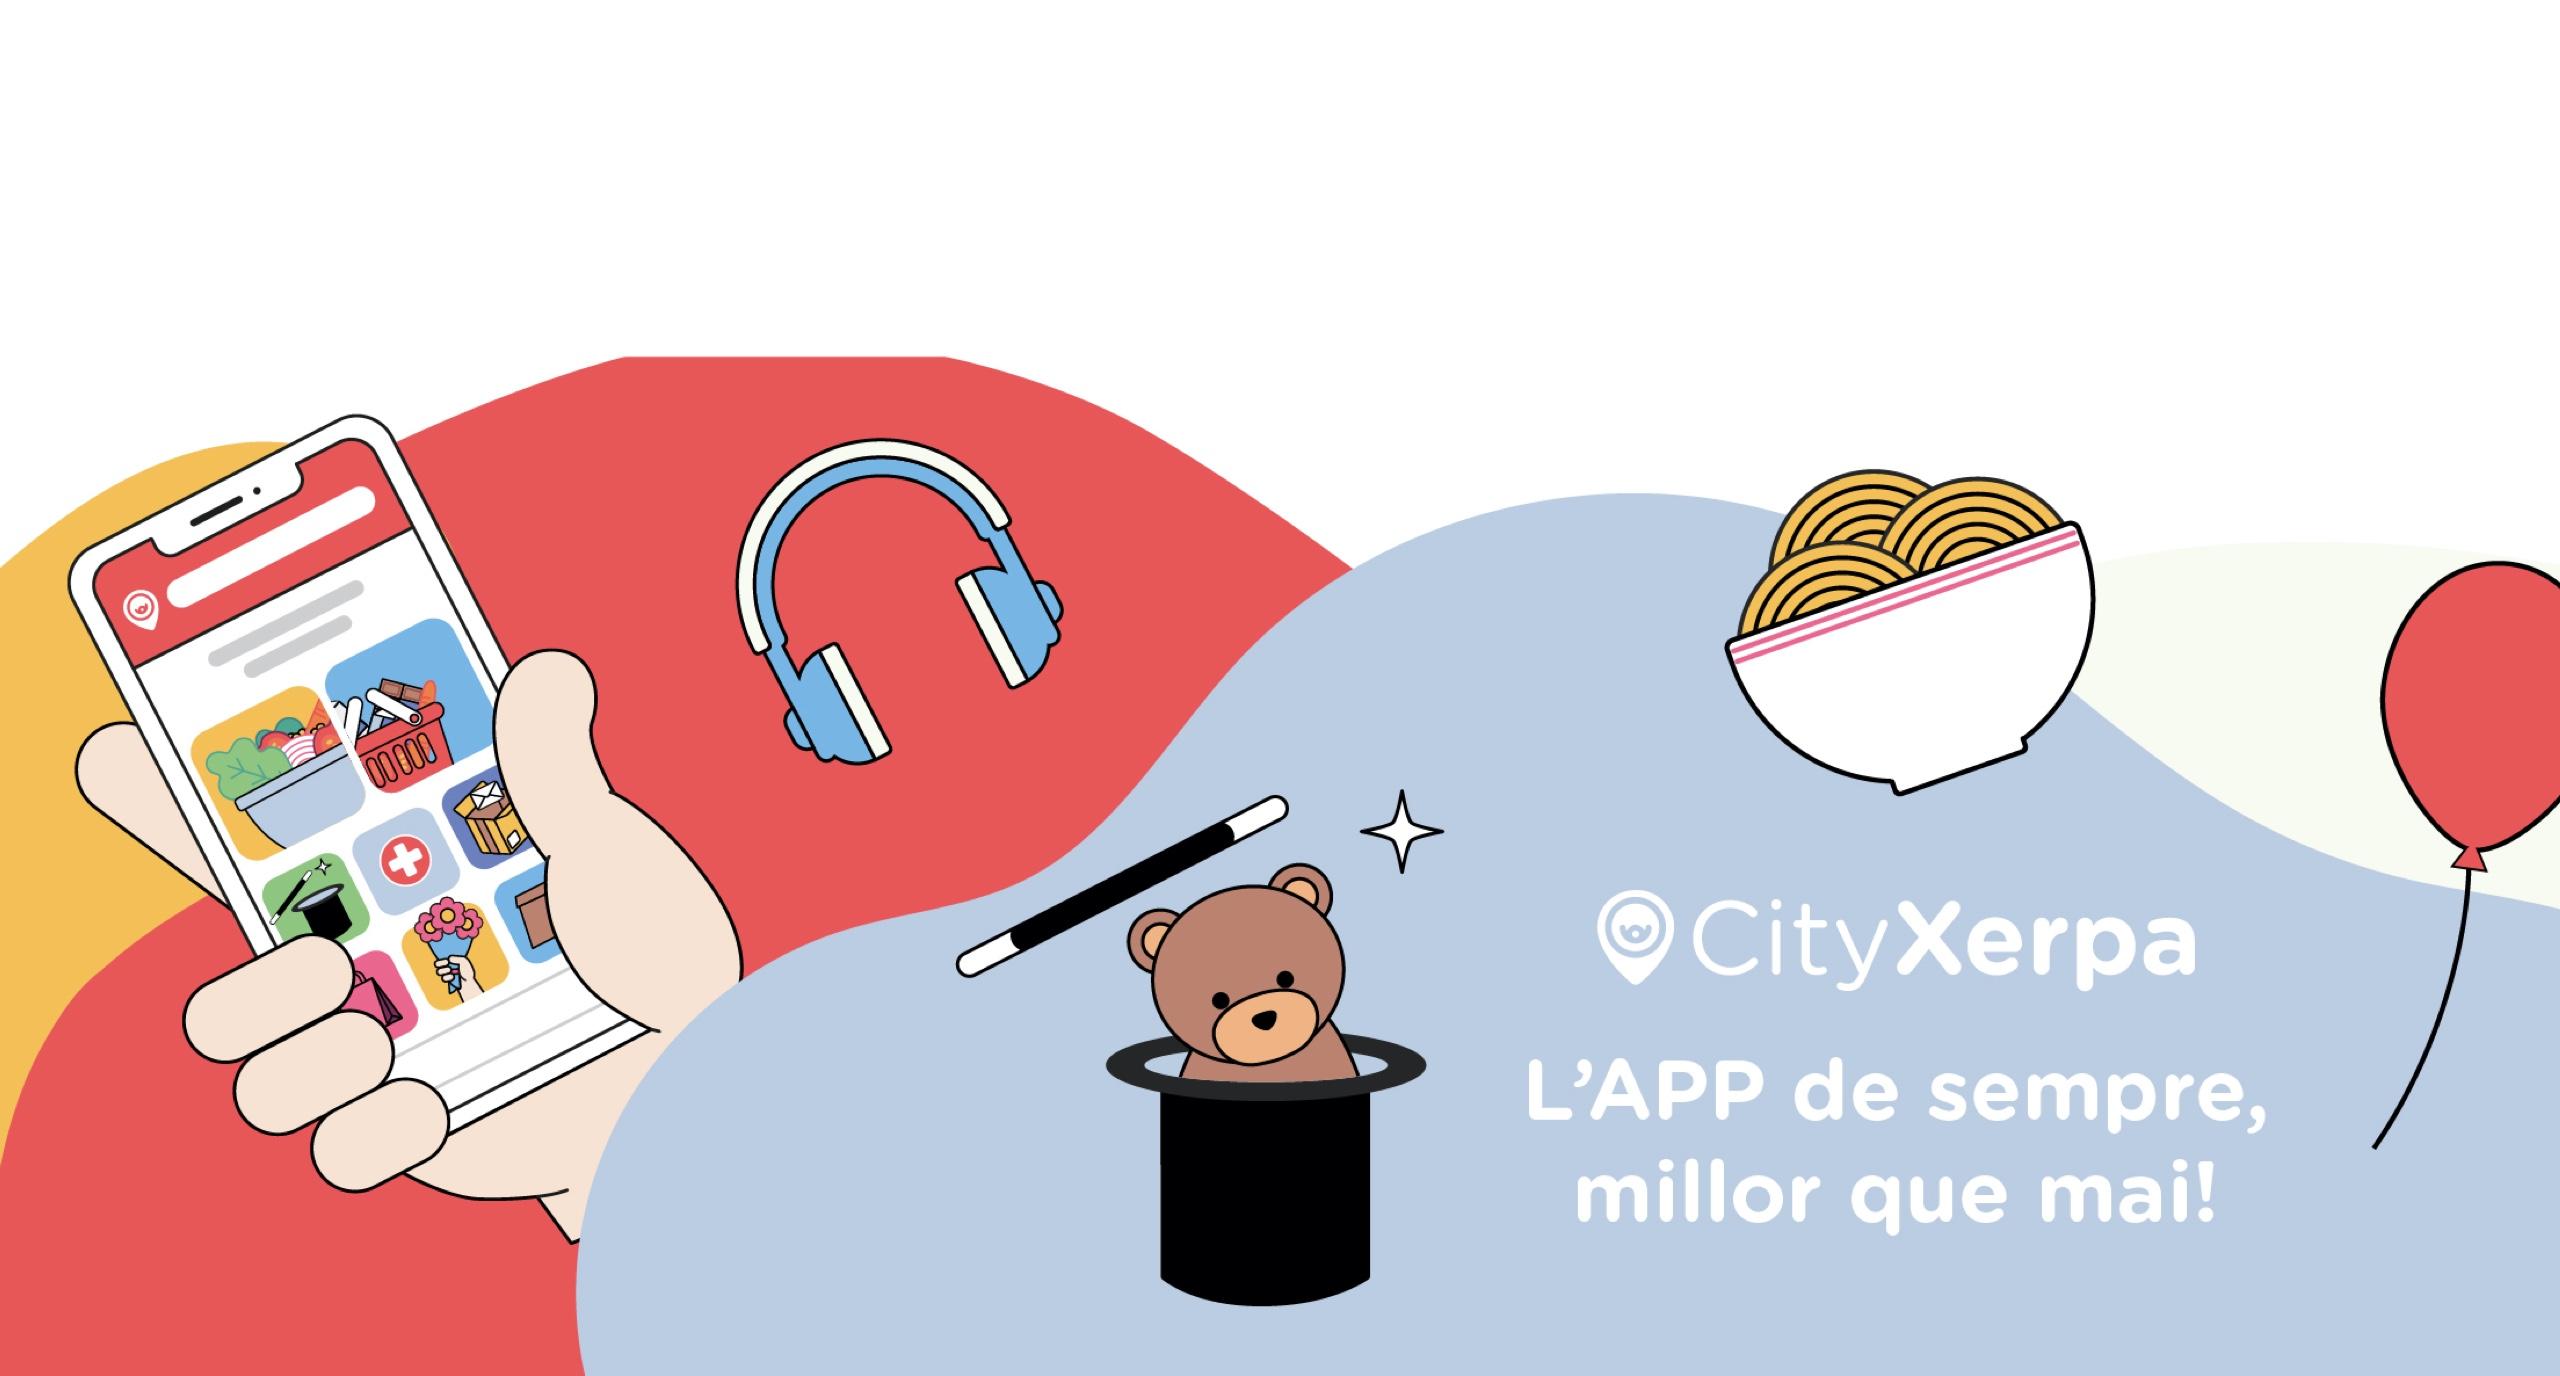 CityXerpa